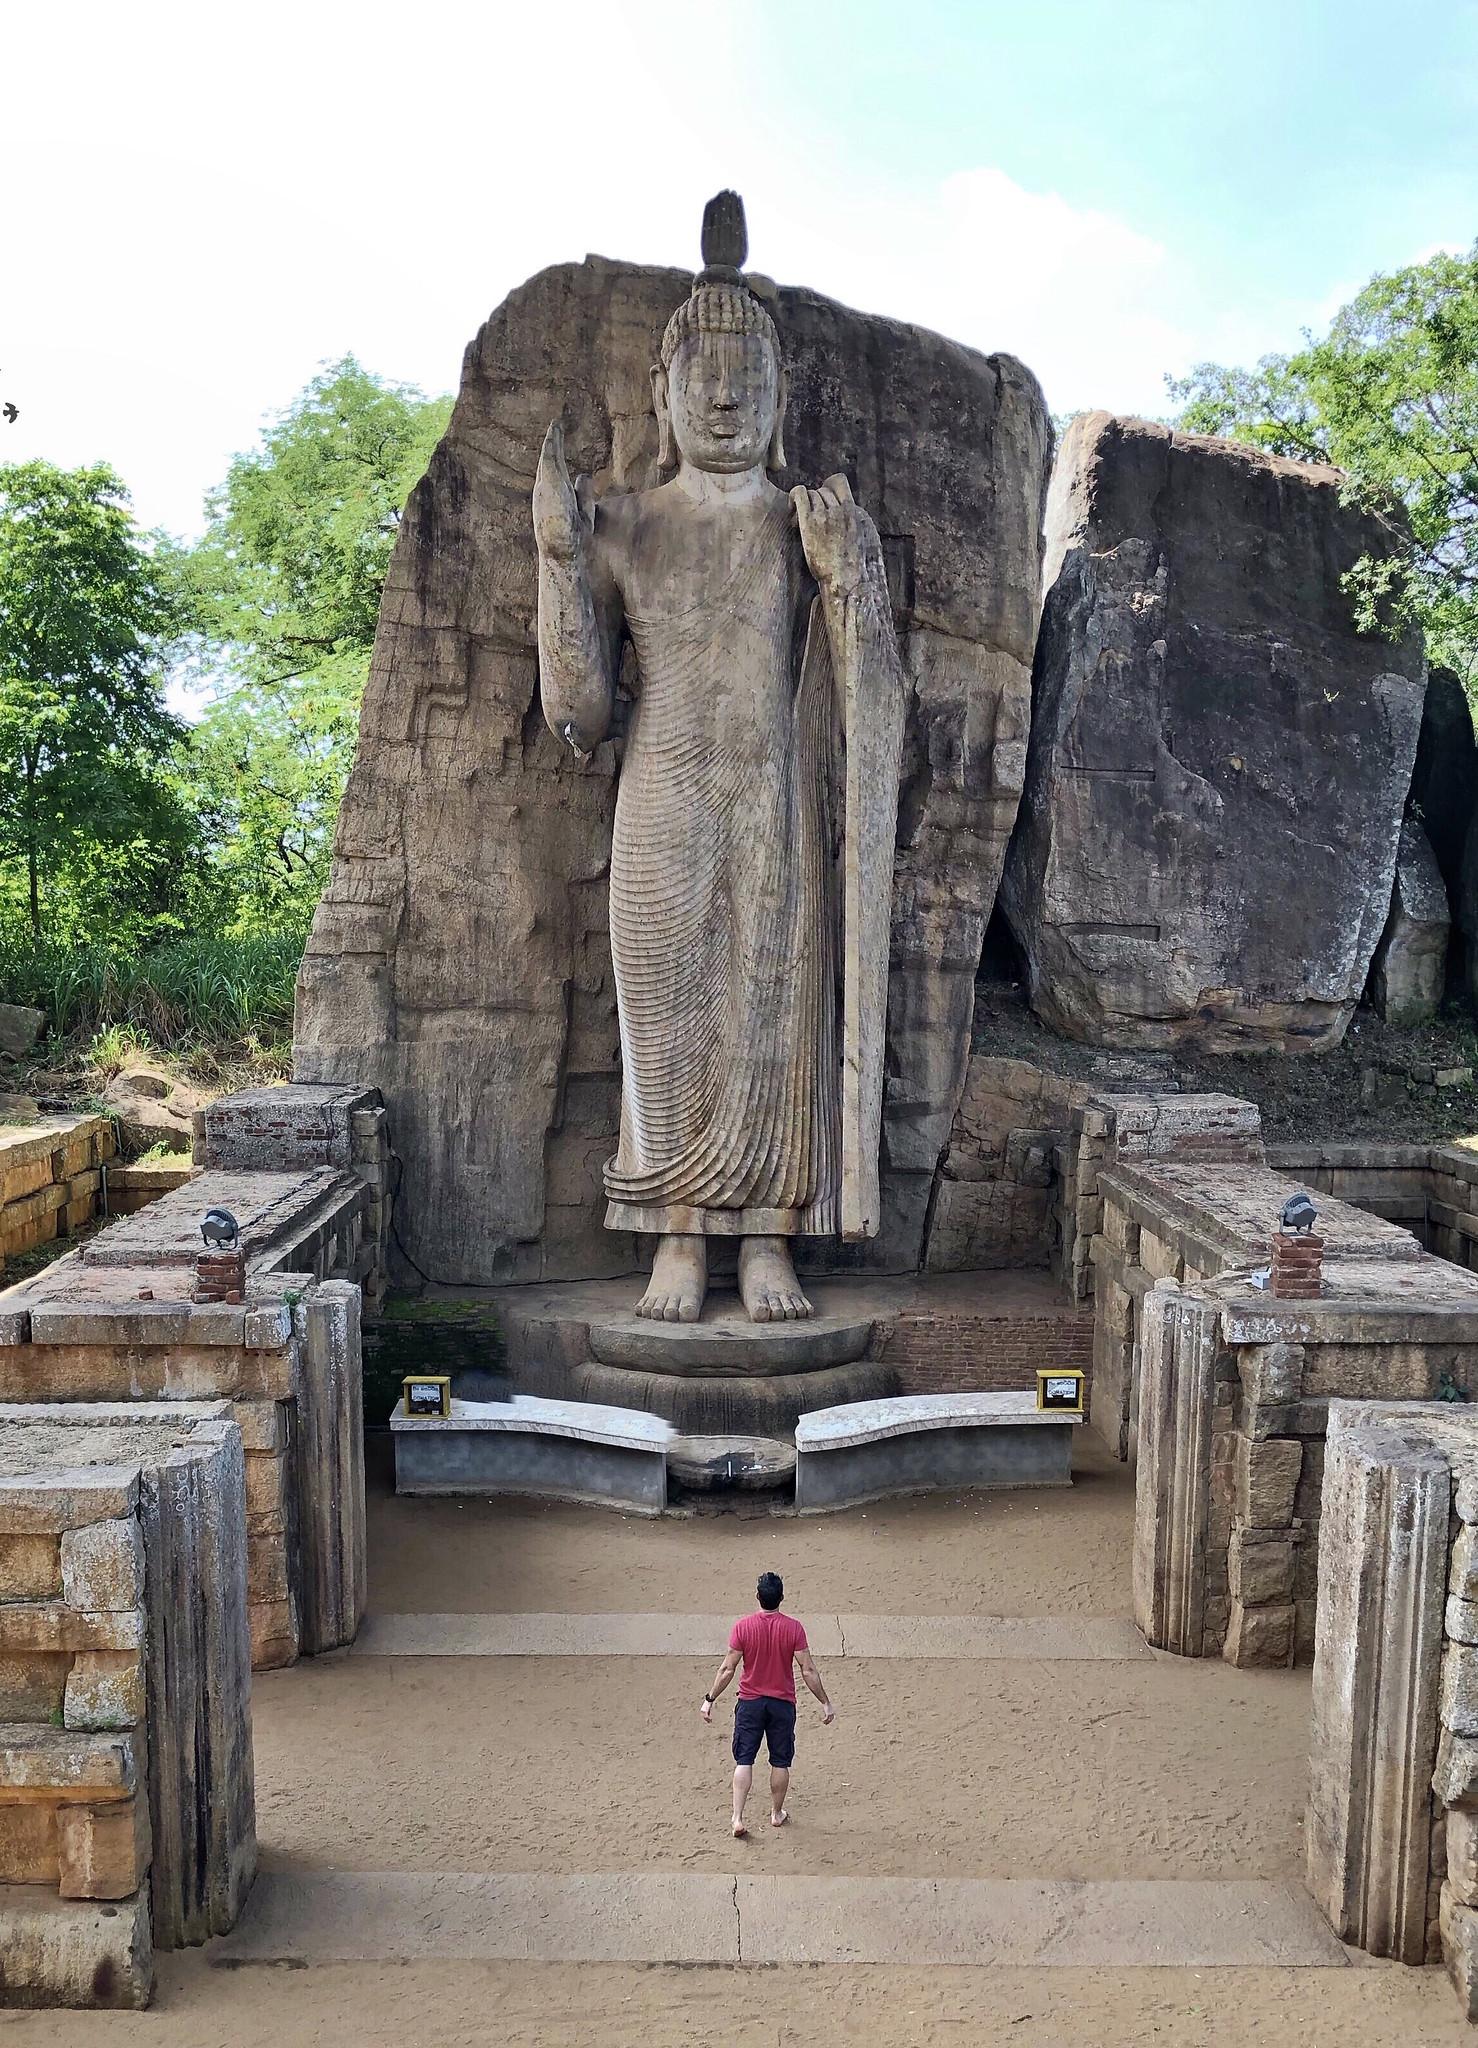 Aukana, la estatua de Buda más alta de Sri Lanka buda de aukana - 46781553031 2c652fdd31 k - Buda de Aukana, la estatua de Buda más alta de Sri Lanka